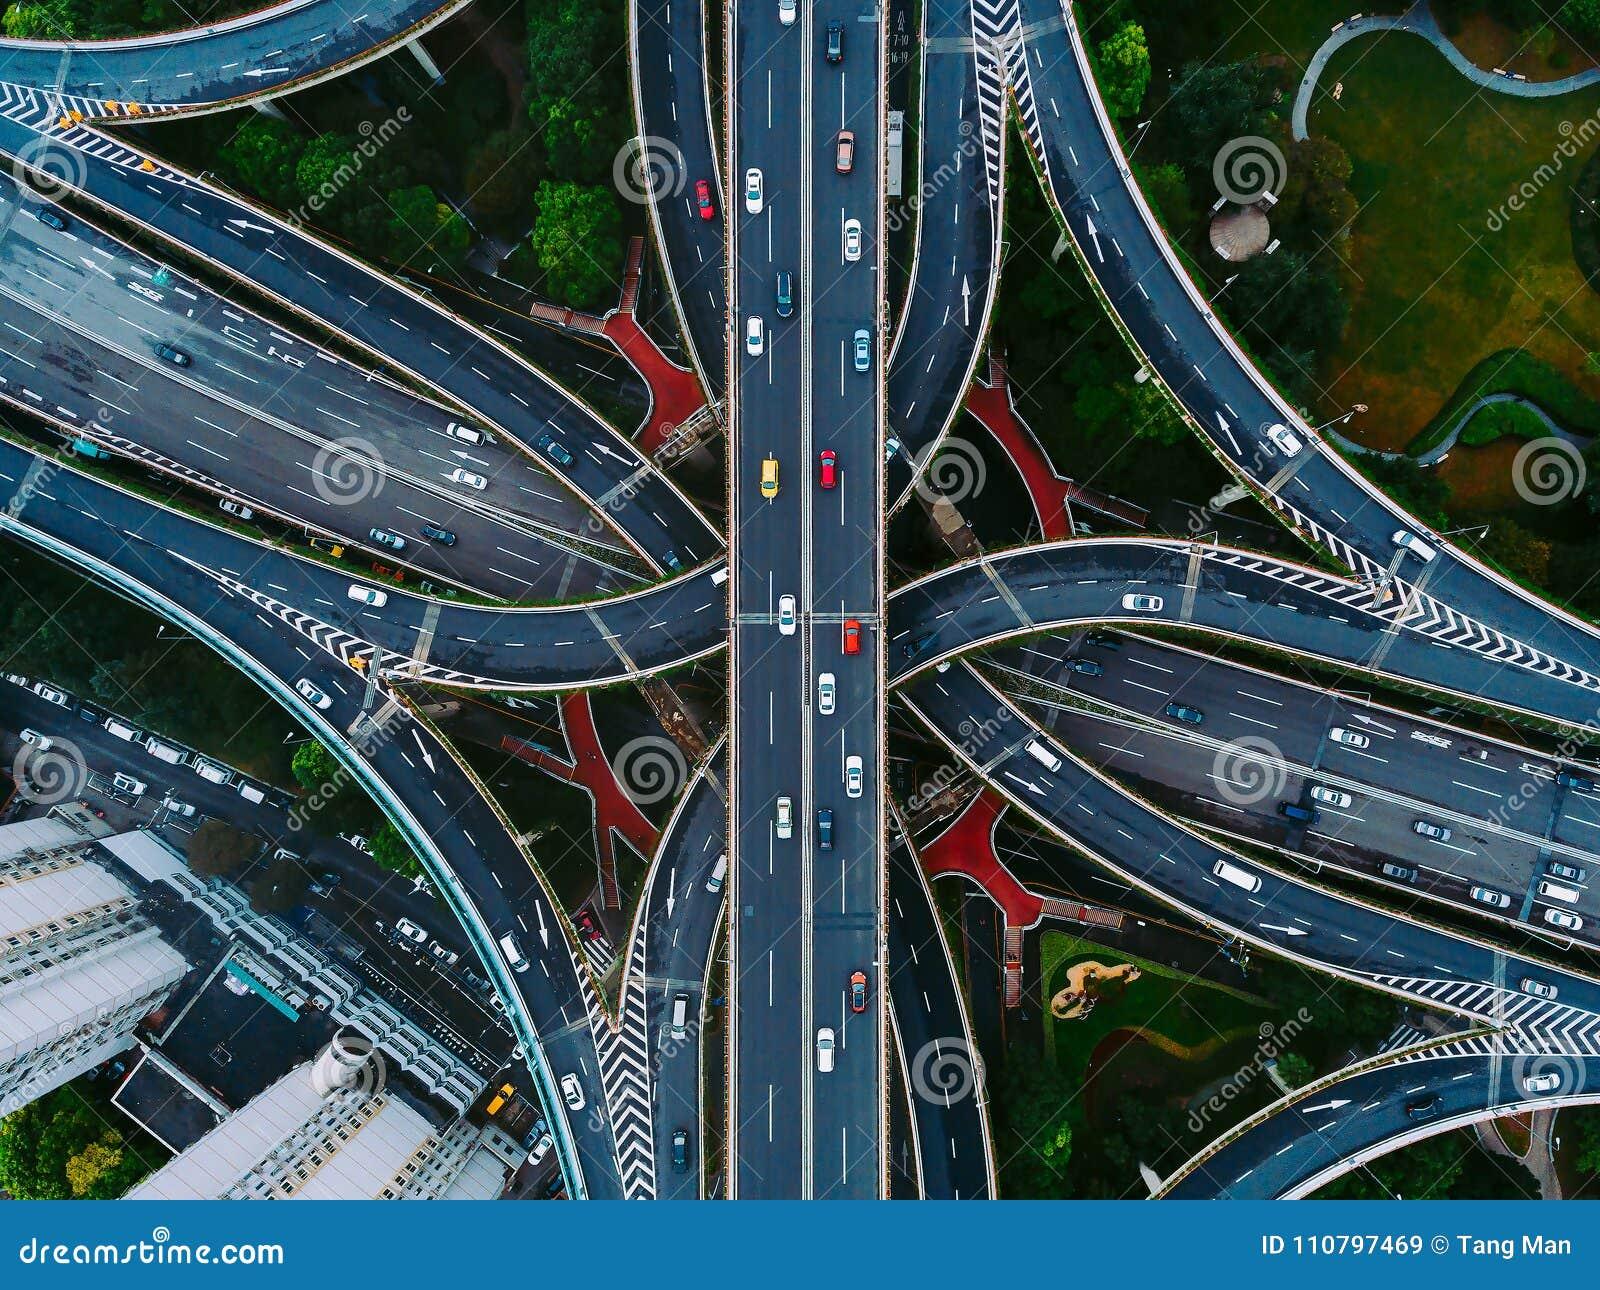 Rues et intersections de Changhaï d en haut